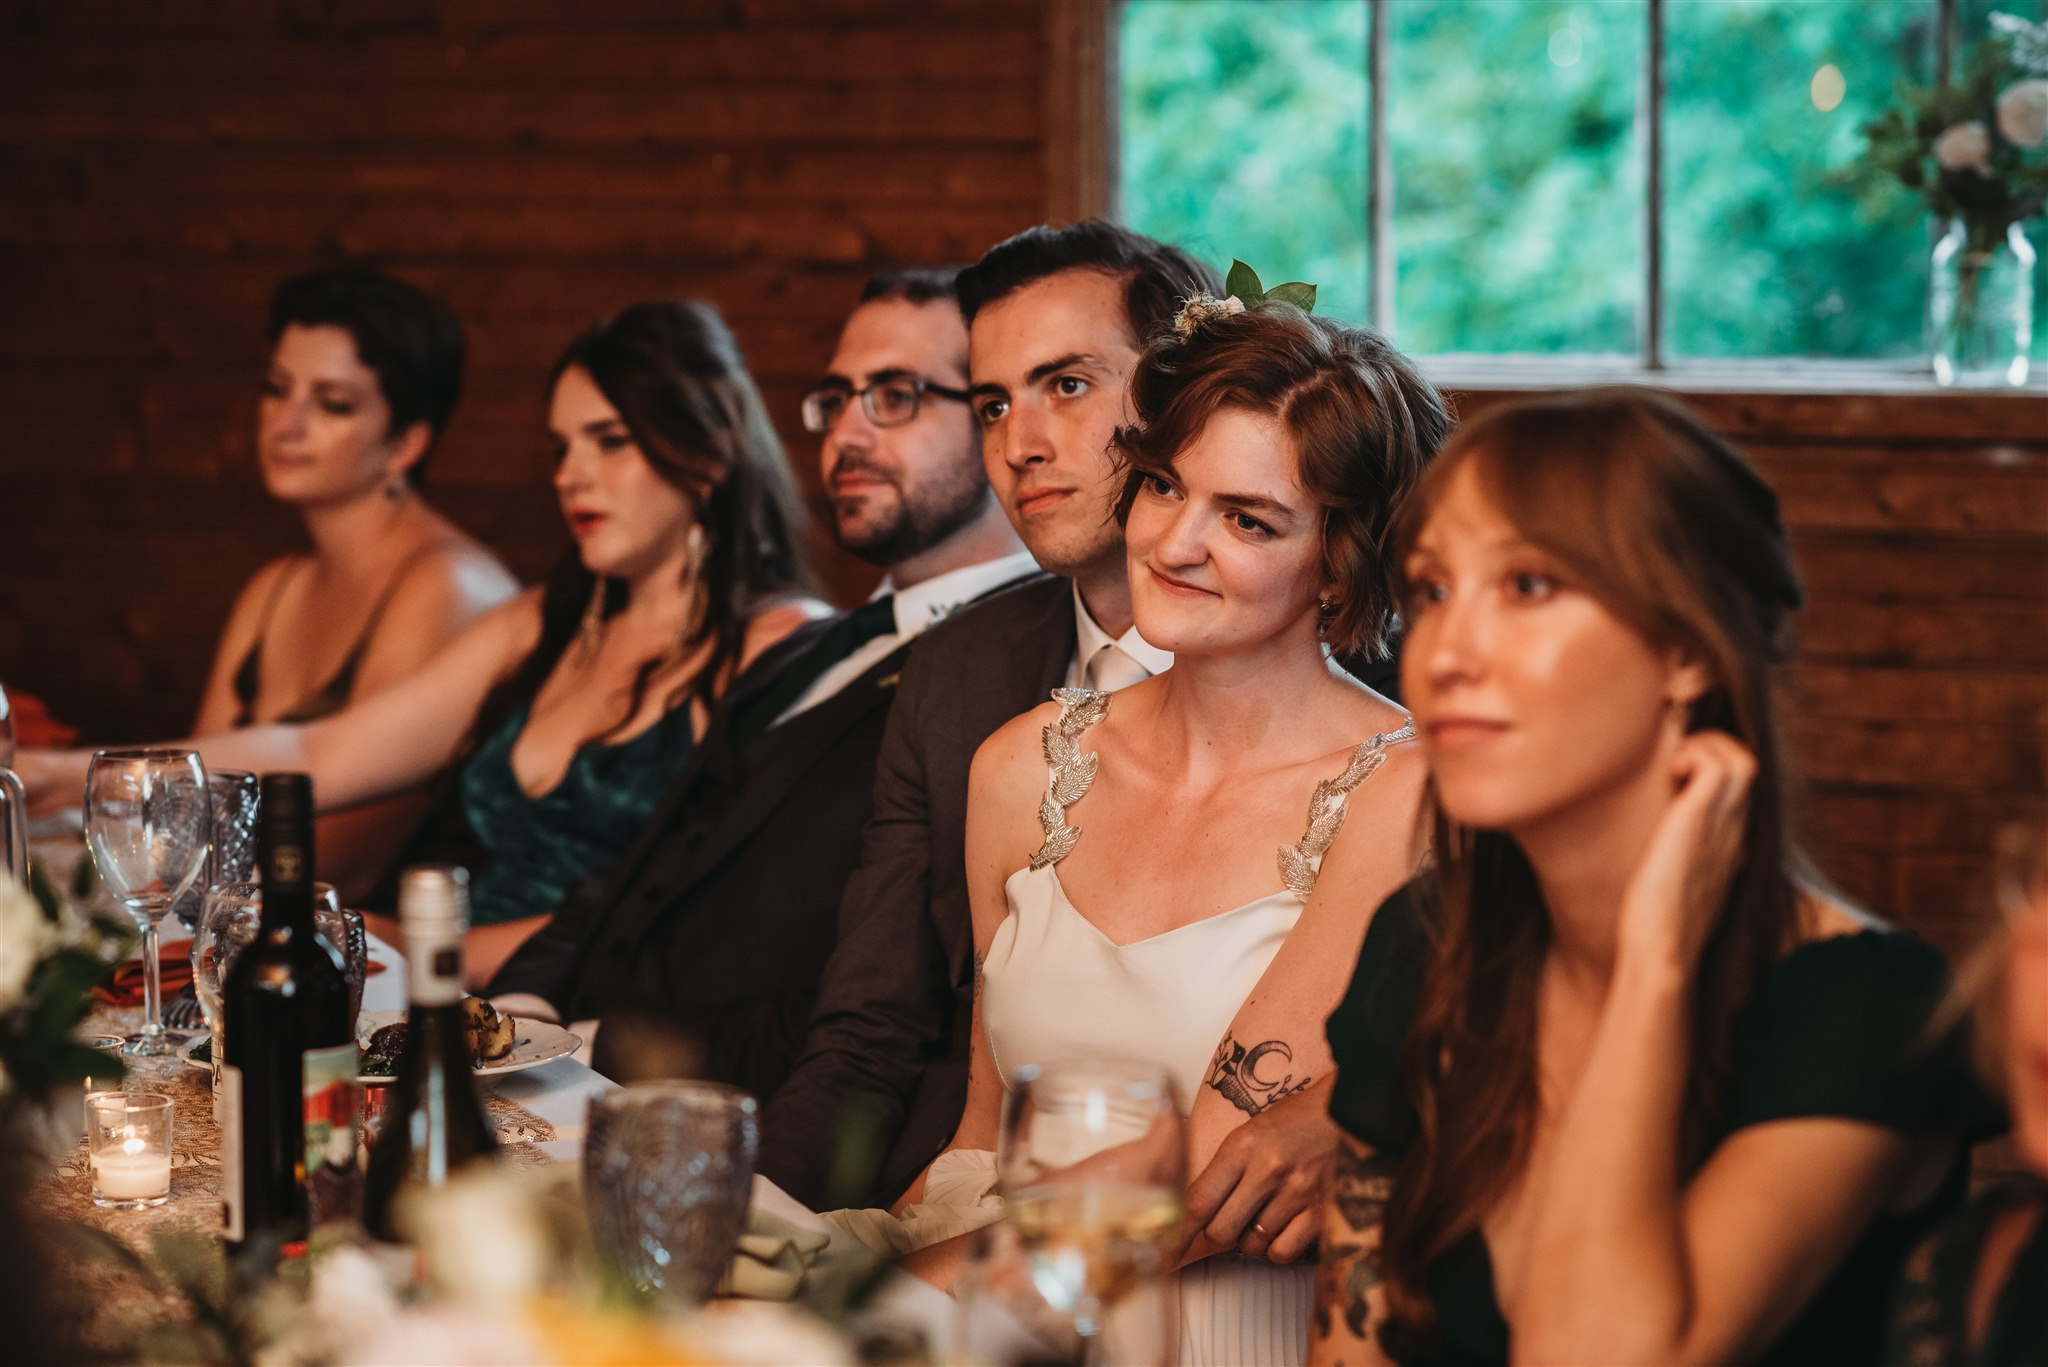 fanshawe conservation area wedding photos 487 1 - Watson Porter Pavillion Wedding